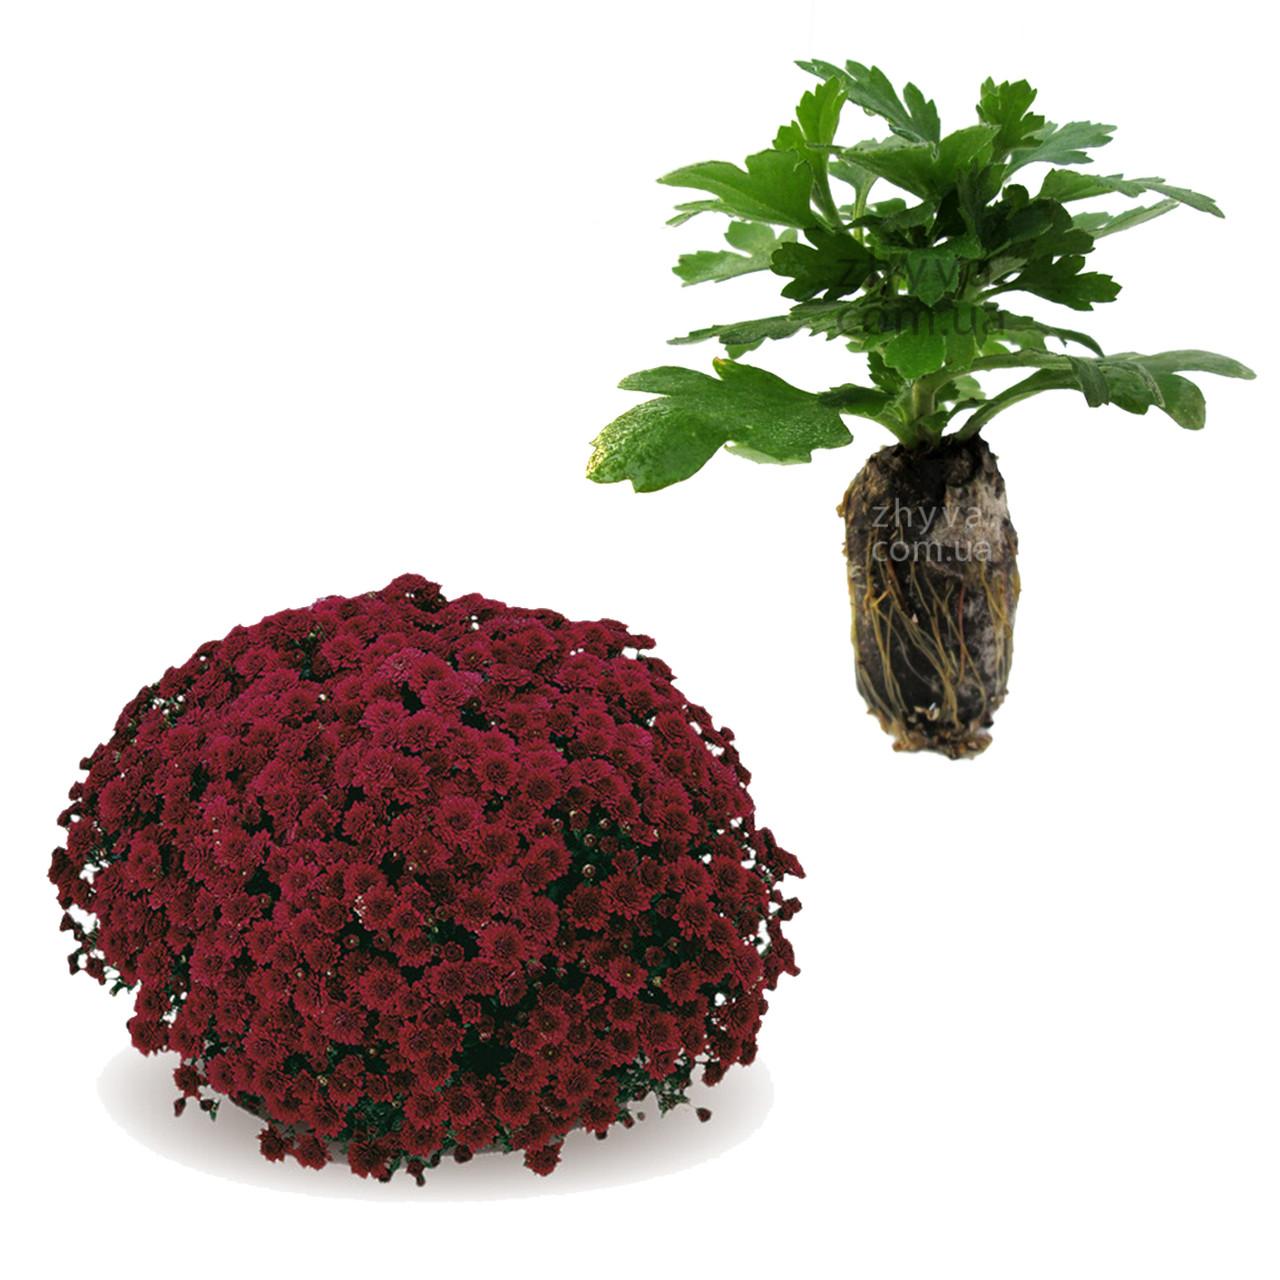 "Саджанці Хризантема Multiflora ""Galatino Purple'' 1шт / Рассада Хризантема Multiflora ""Galatino Purple''"